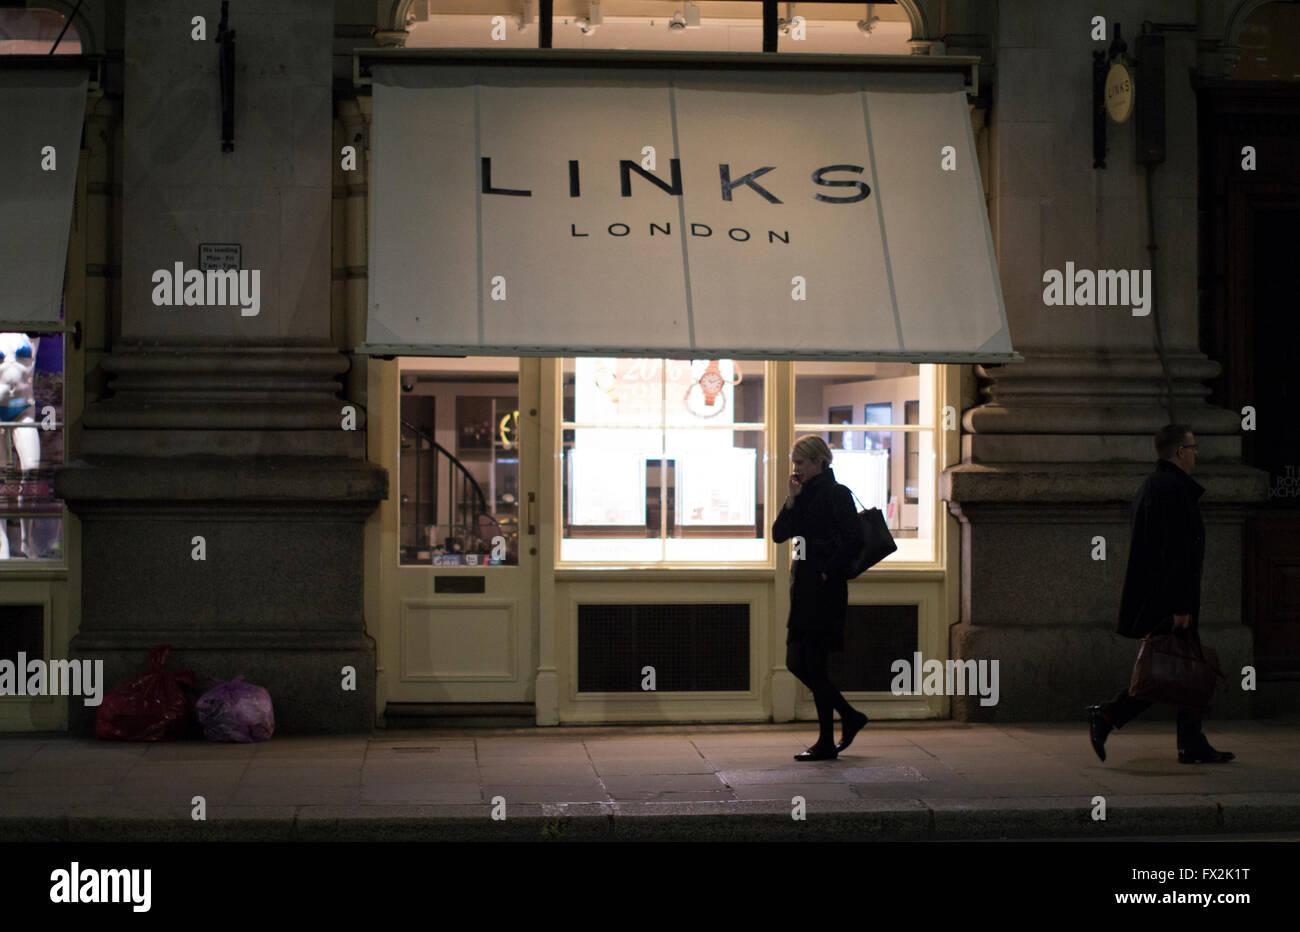 Links of London  jewellery shop - Stock Image